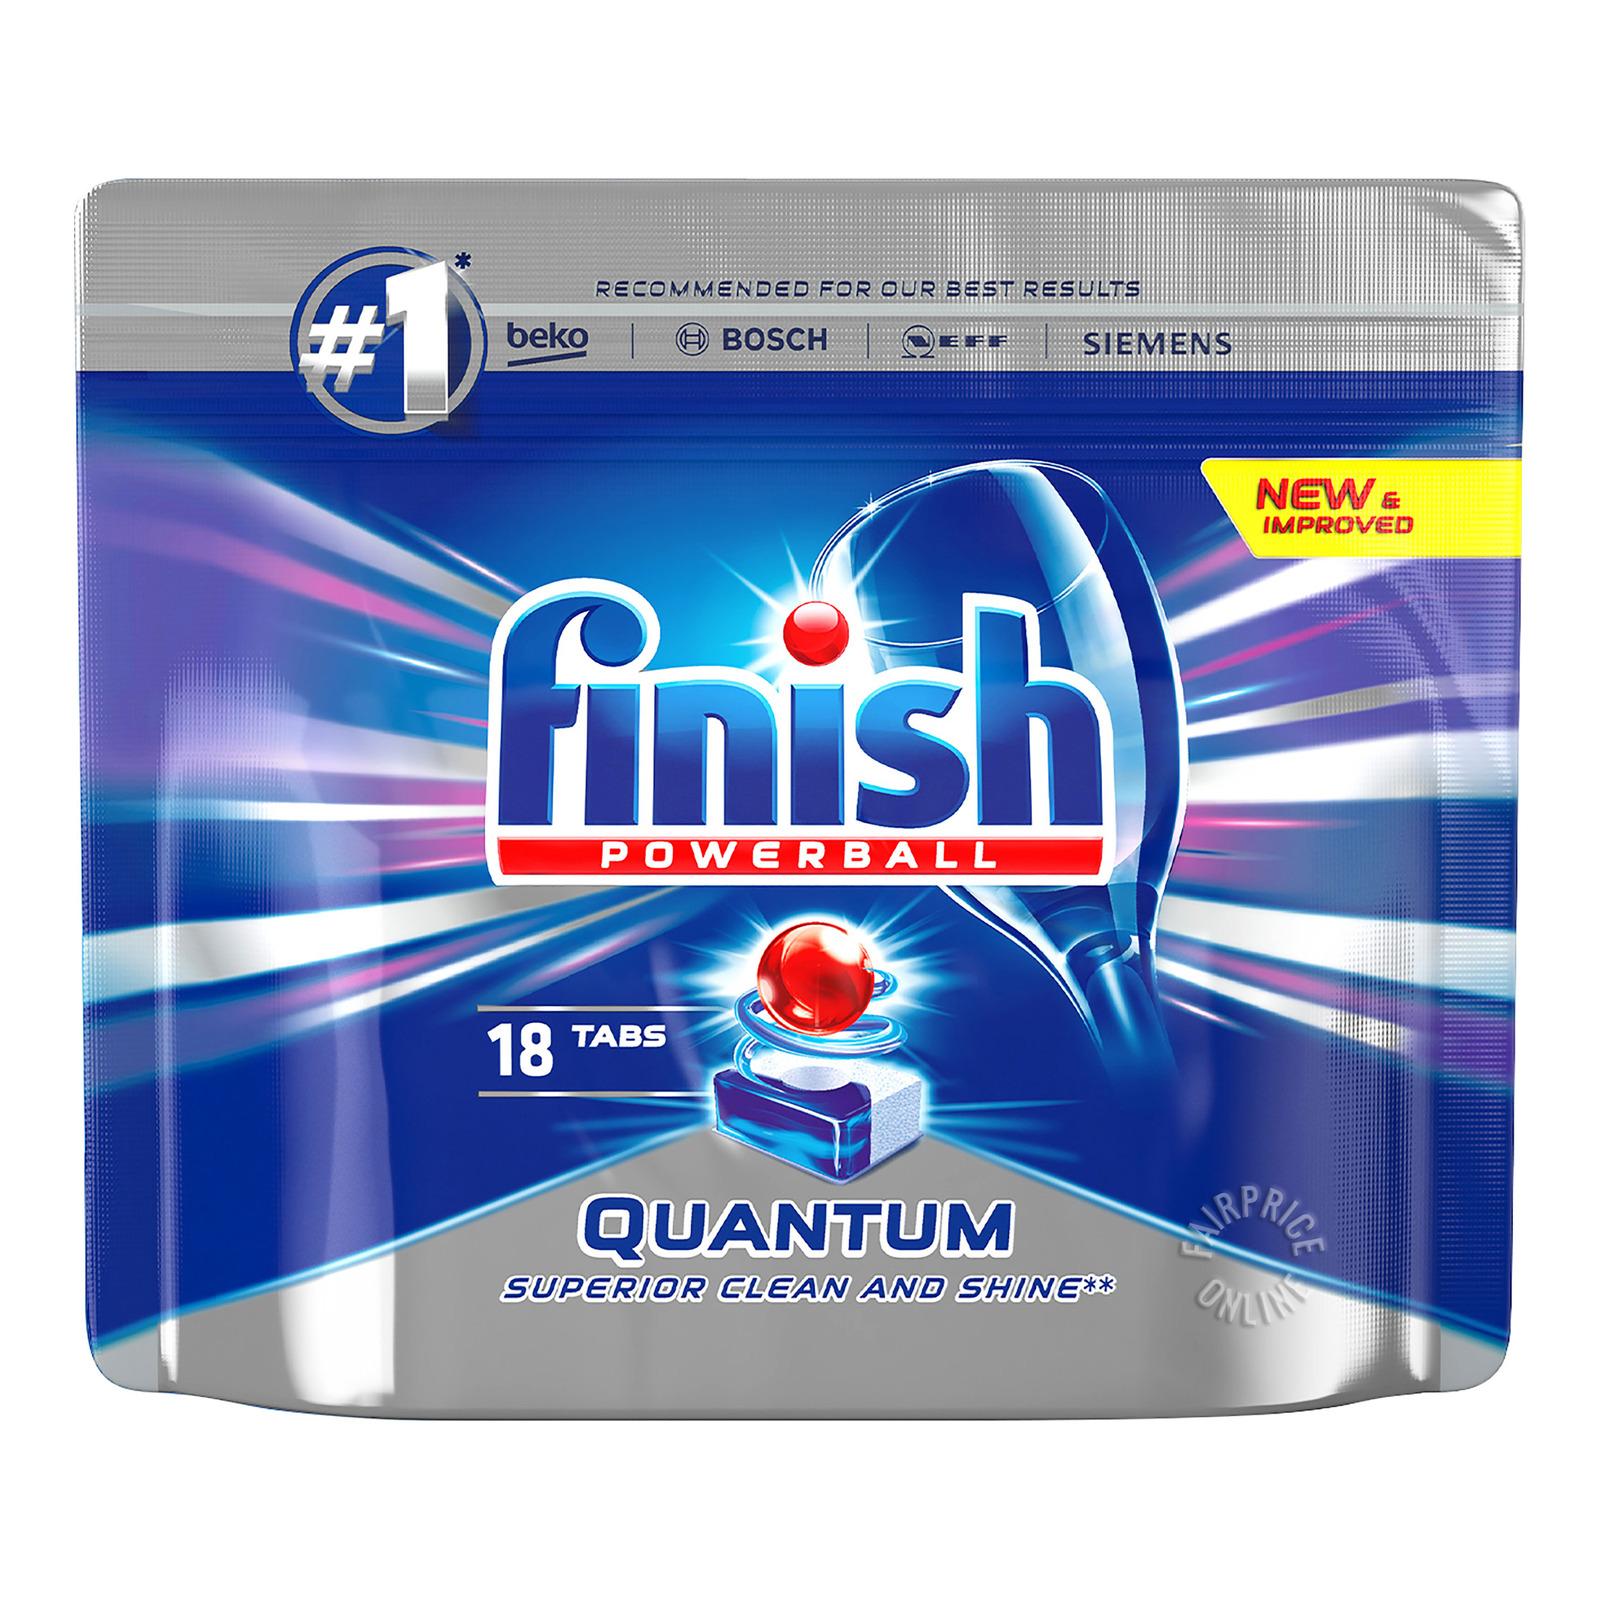 Finish Powerball Dishwasher Detergent Washer - QuantumMax